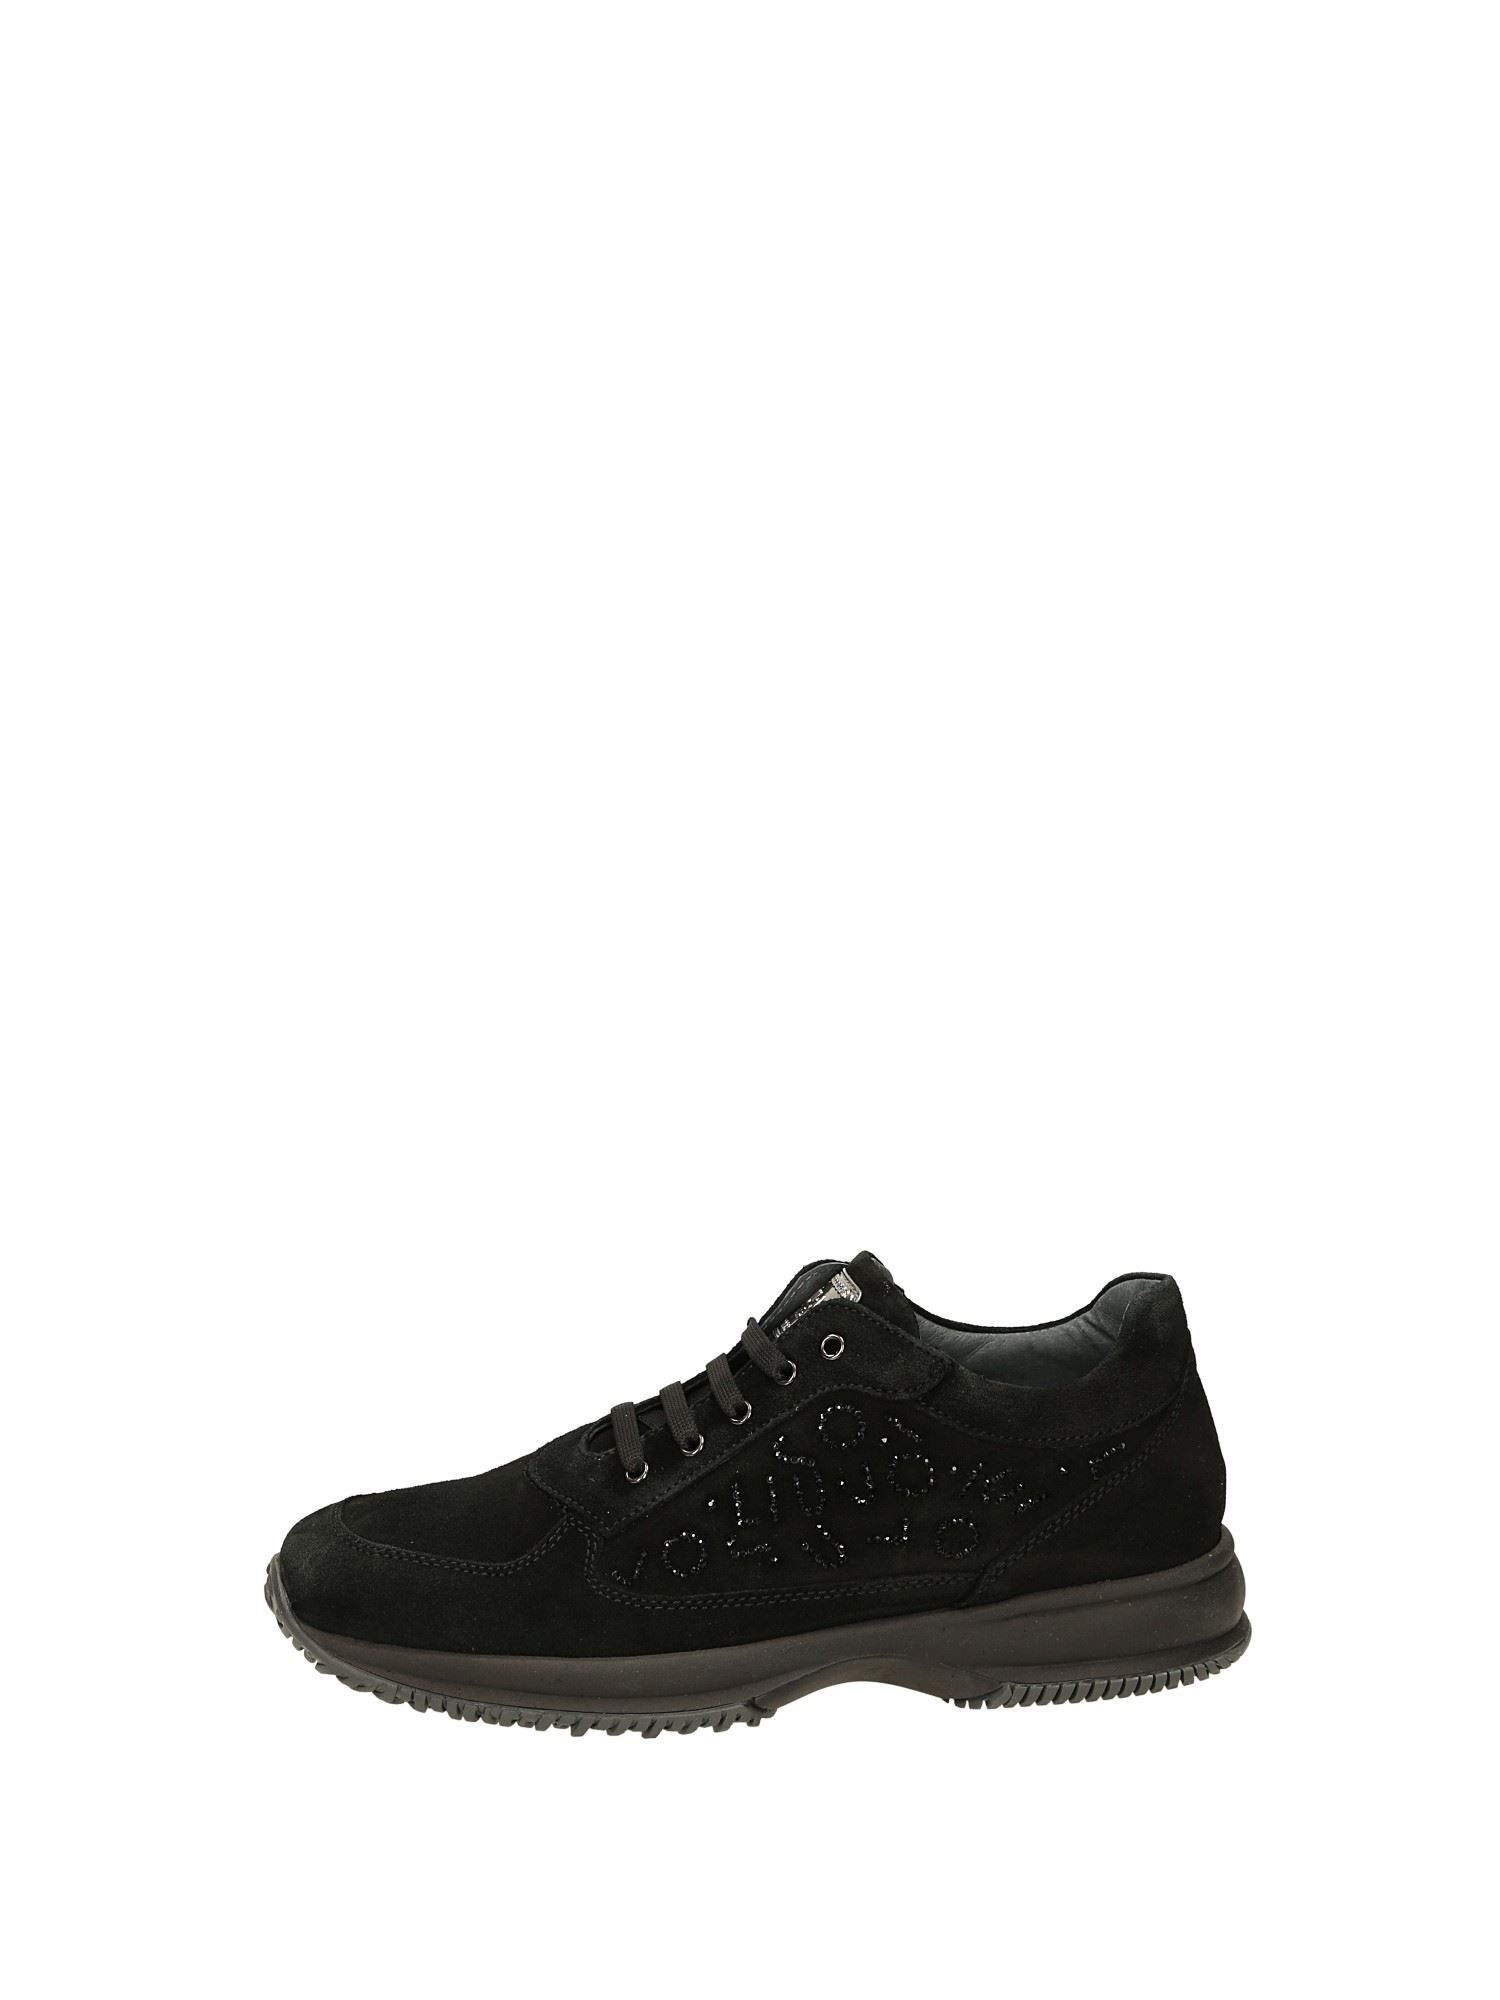 Sneakers-Basse-Donna-Liu-Jo-Girl-UB21642-Autunno-Inverno